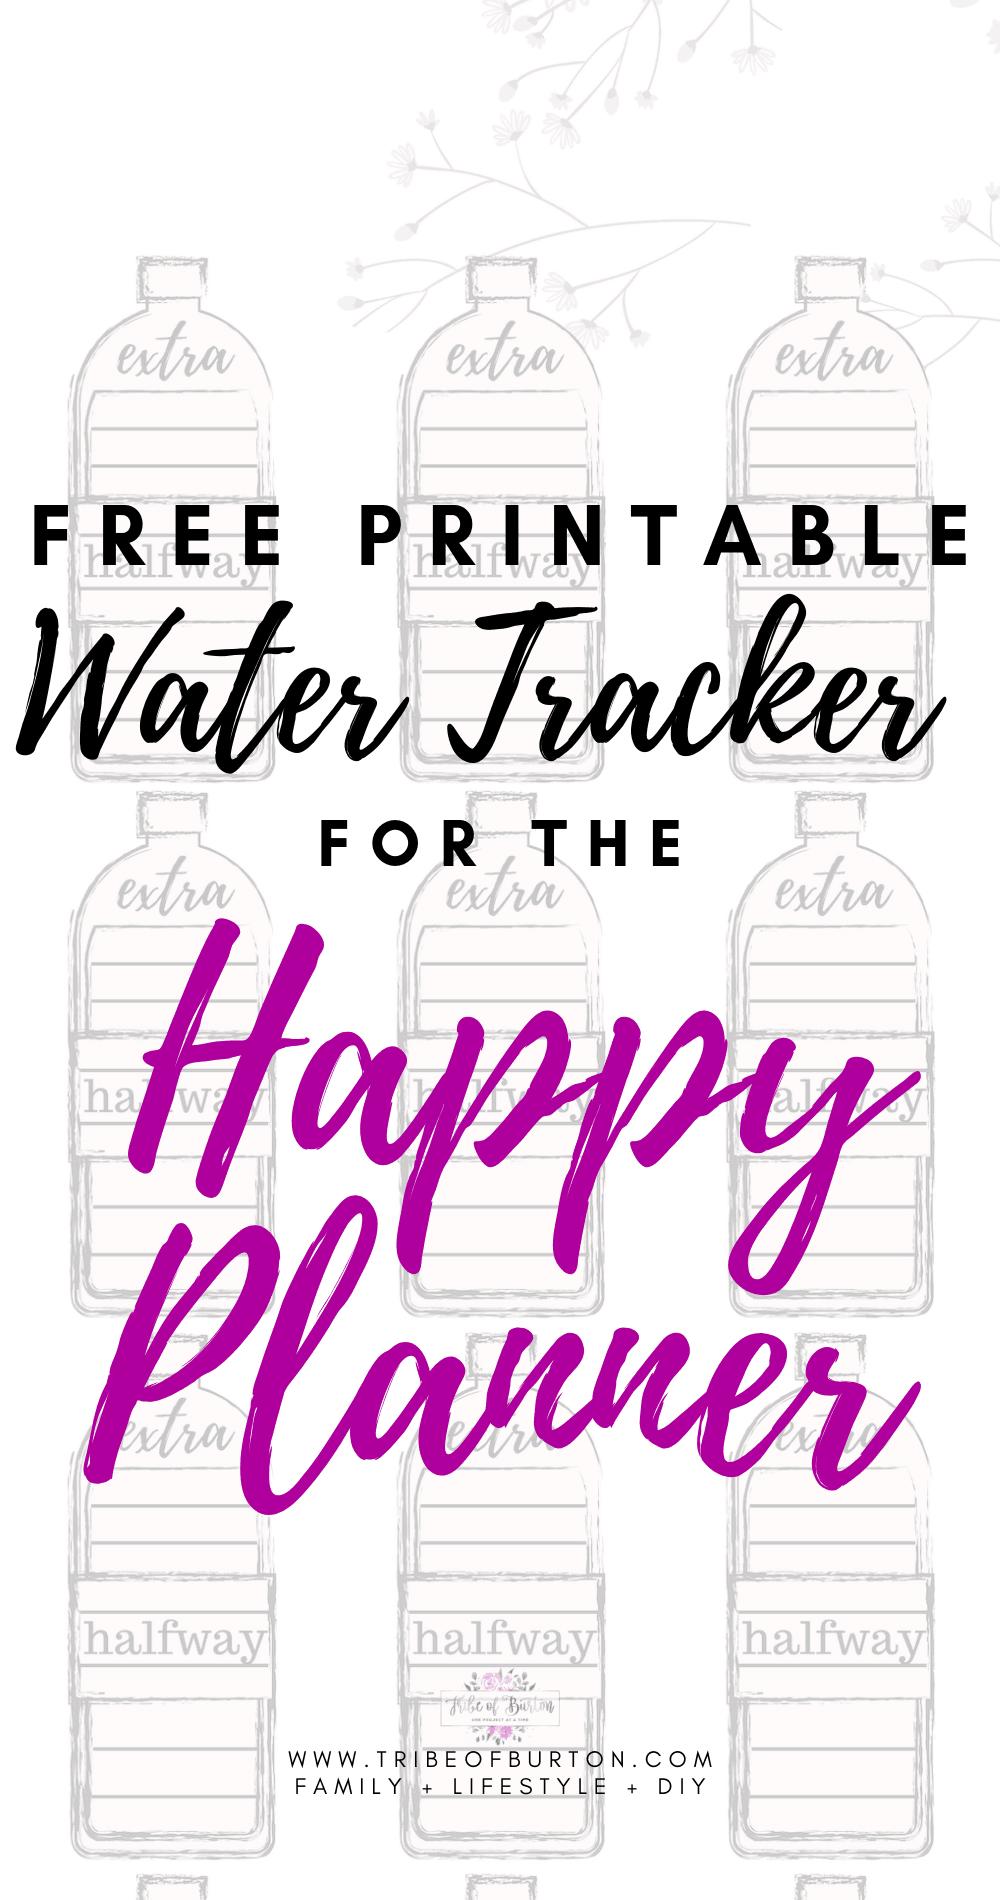 photograph regarding Printable Water Tracker identify How I Monitor My H2o - Obtain No cost Printable - tribe of burton